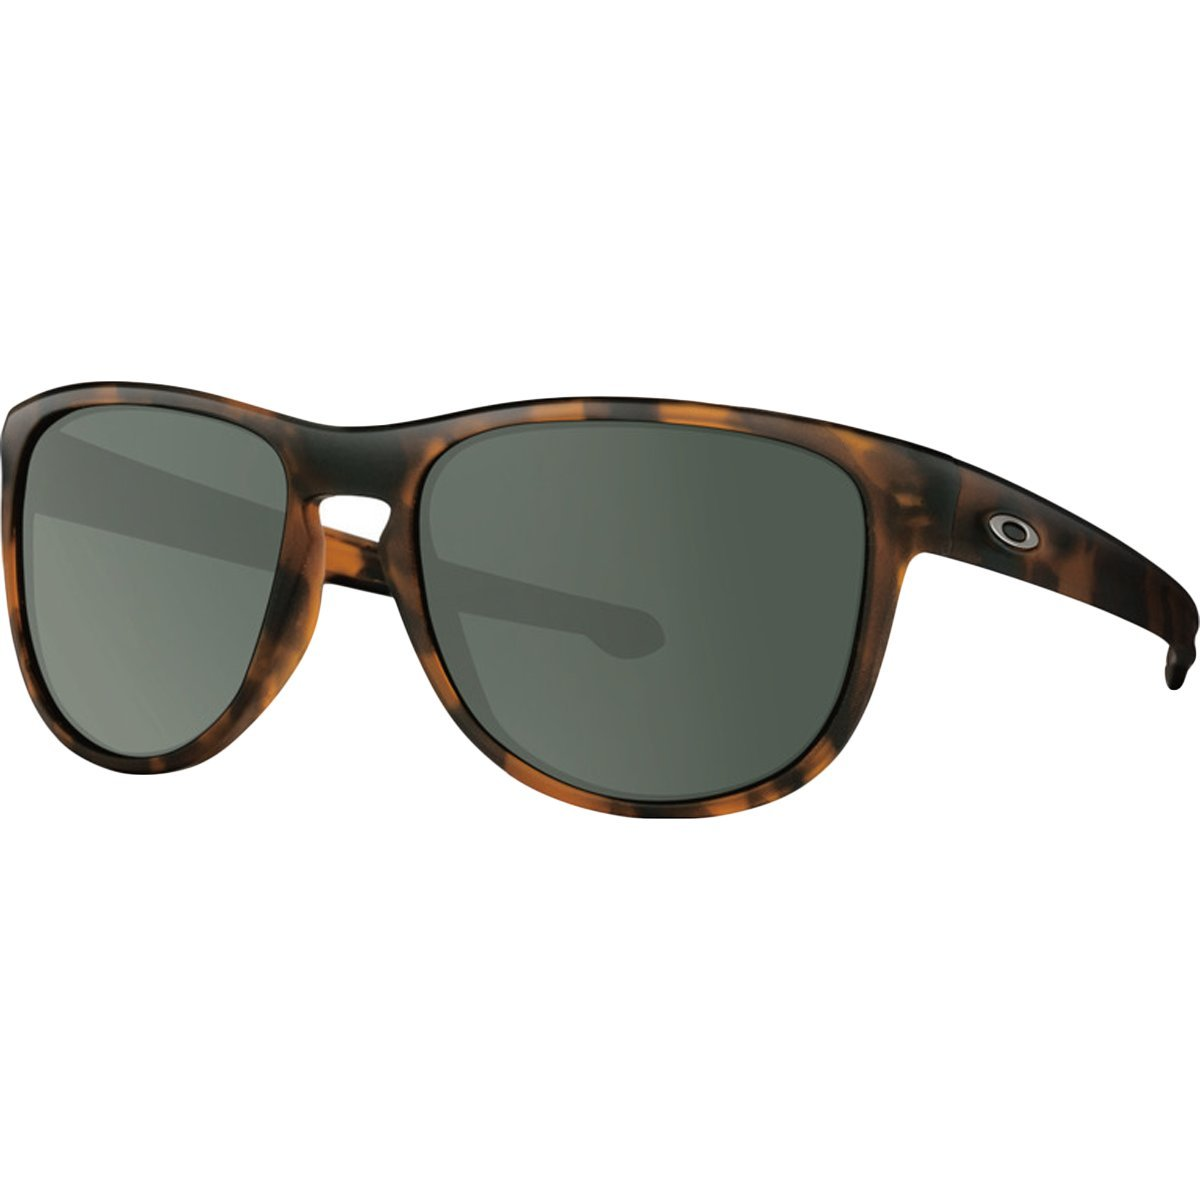 Oakley Mens Sliver R Sunglasses, Soft Coat Brown Tortoise/Dark Grey, One Size